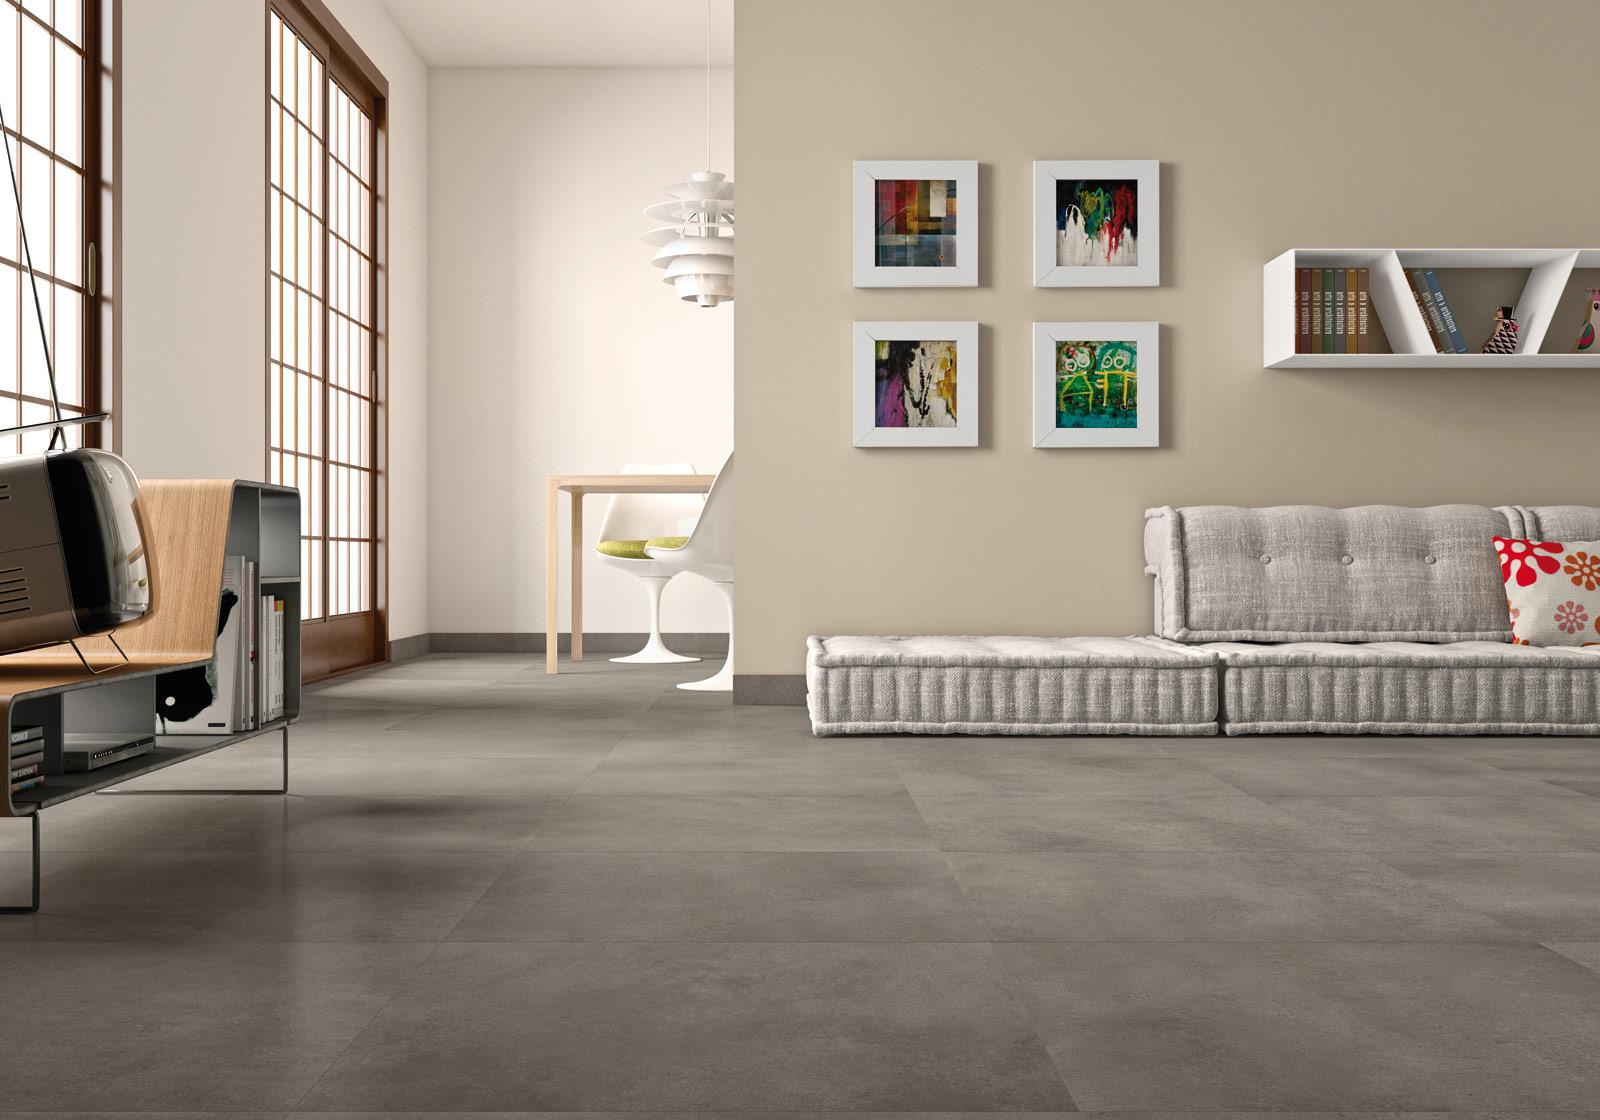 Denver indoor porcelain stoneware marazzi denver concrete effect living room dailygadgetfo Images